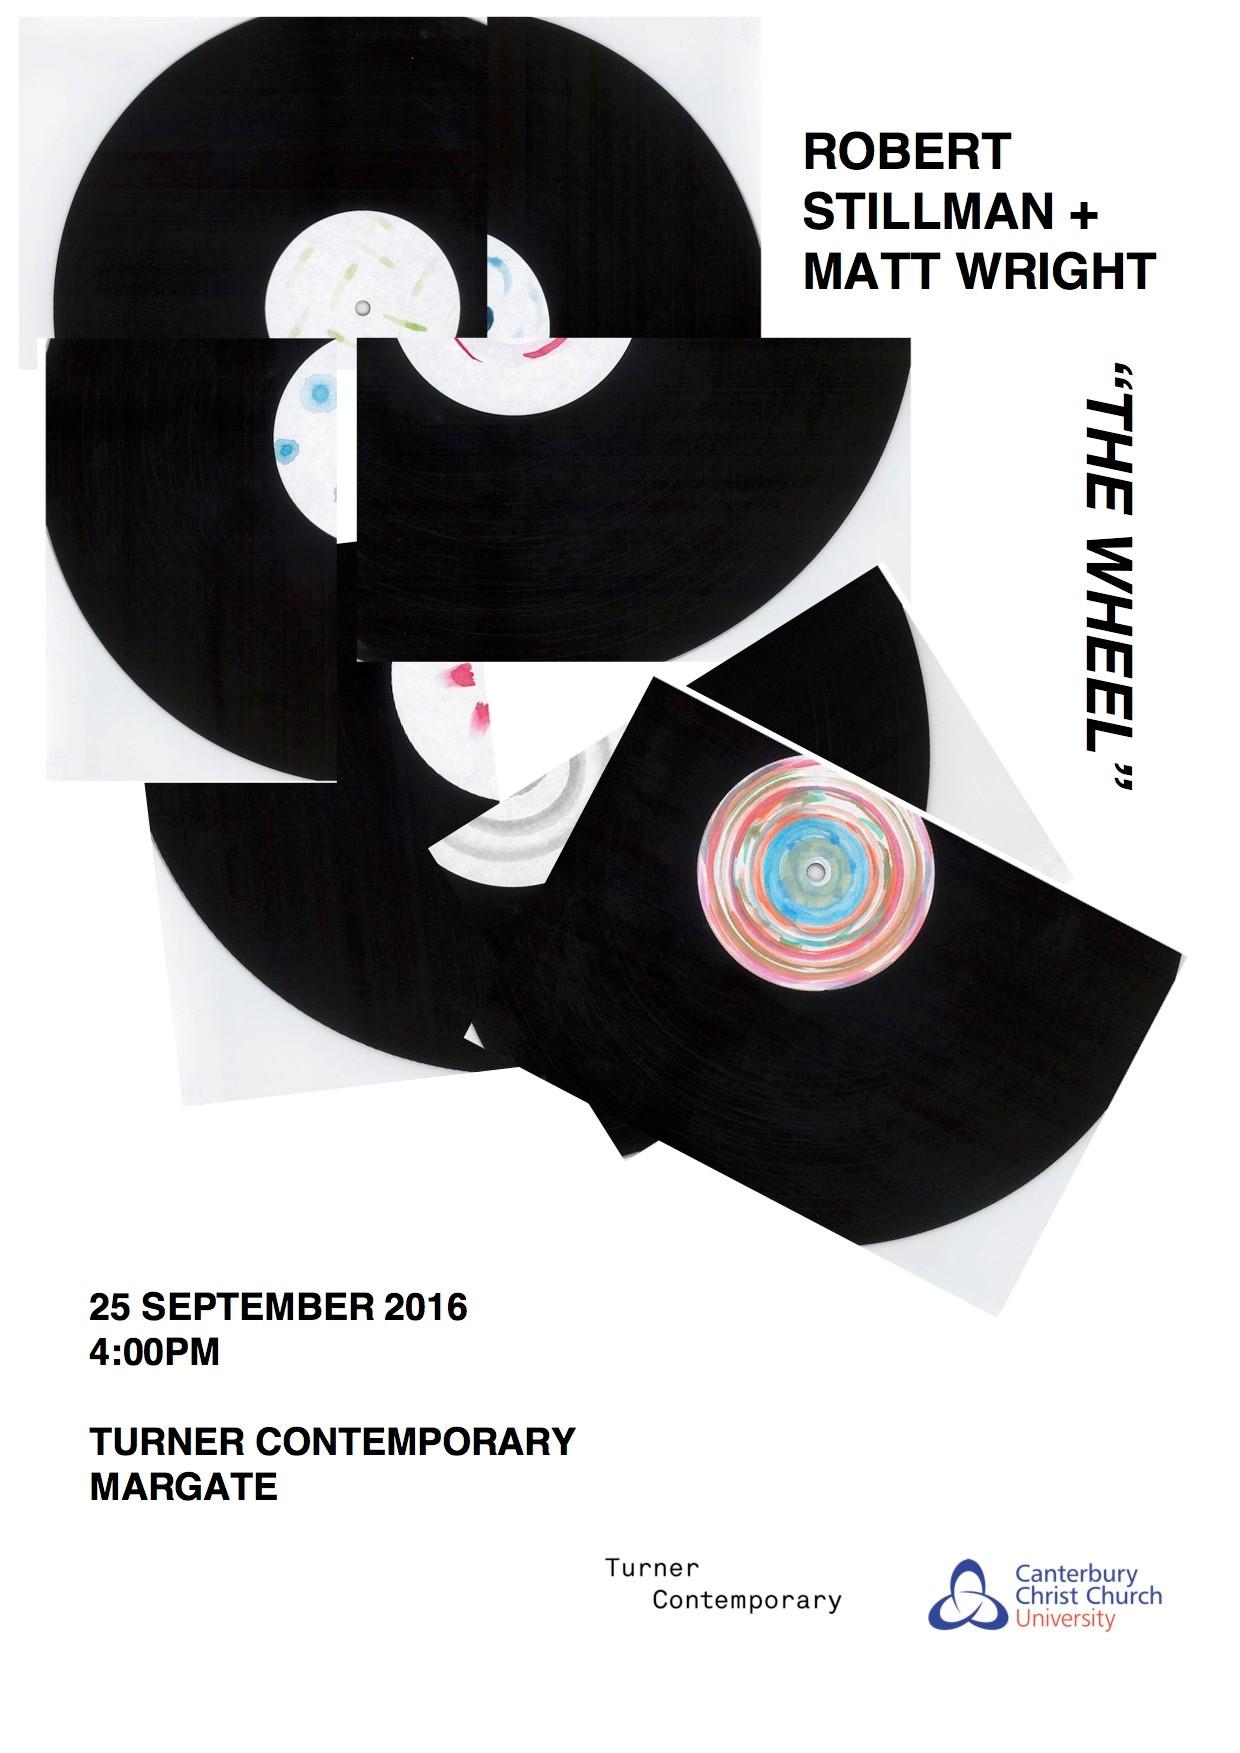 Robert Stillman and Matt Wright: The Wheel